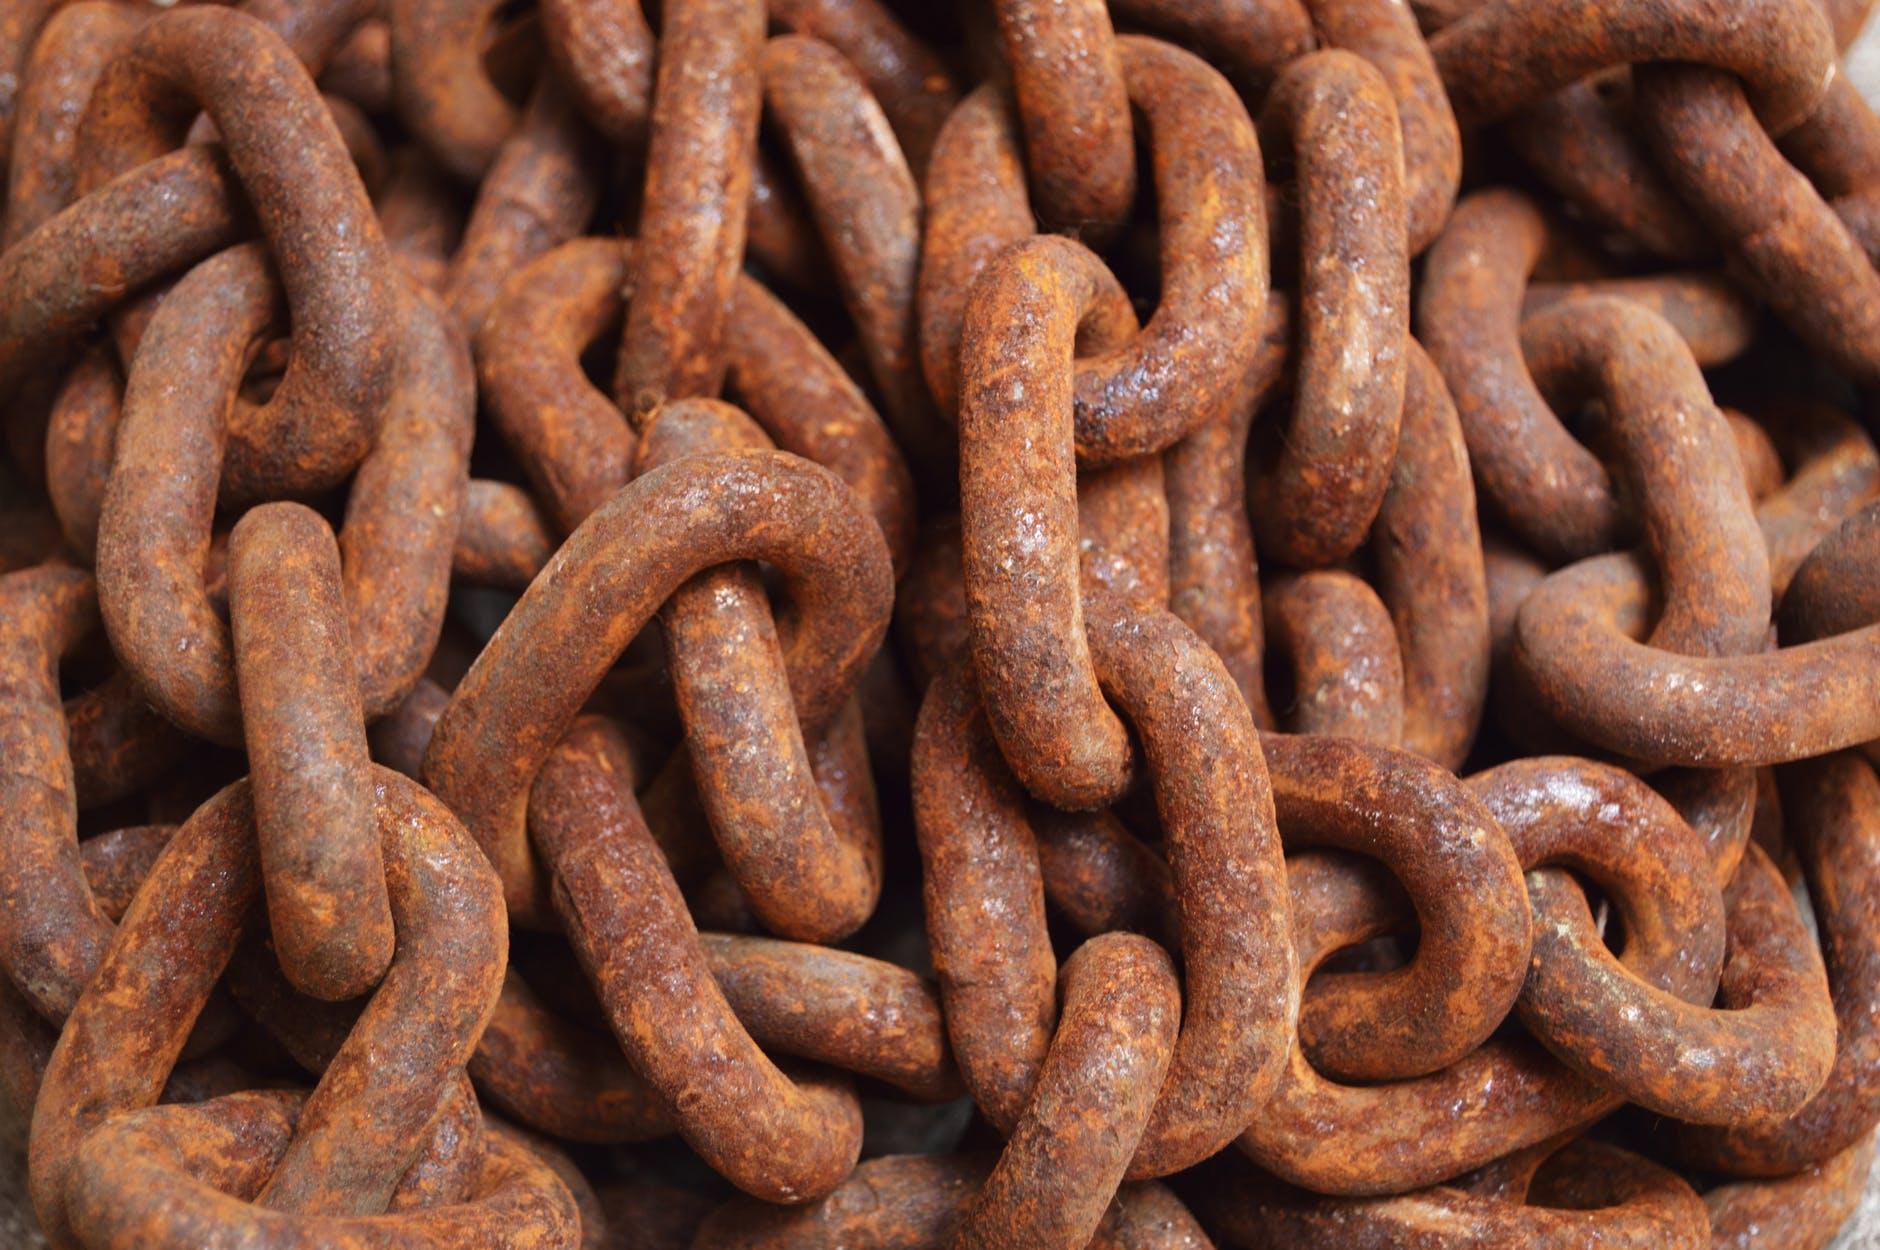 aged brown chain close